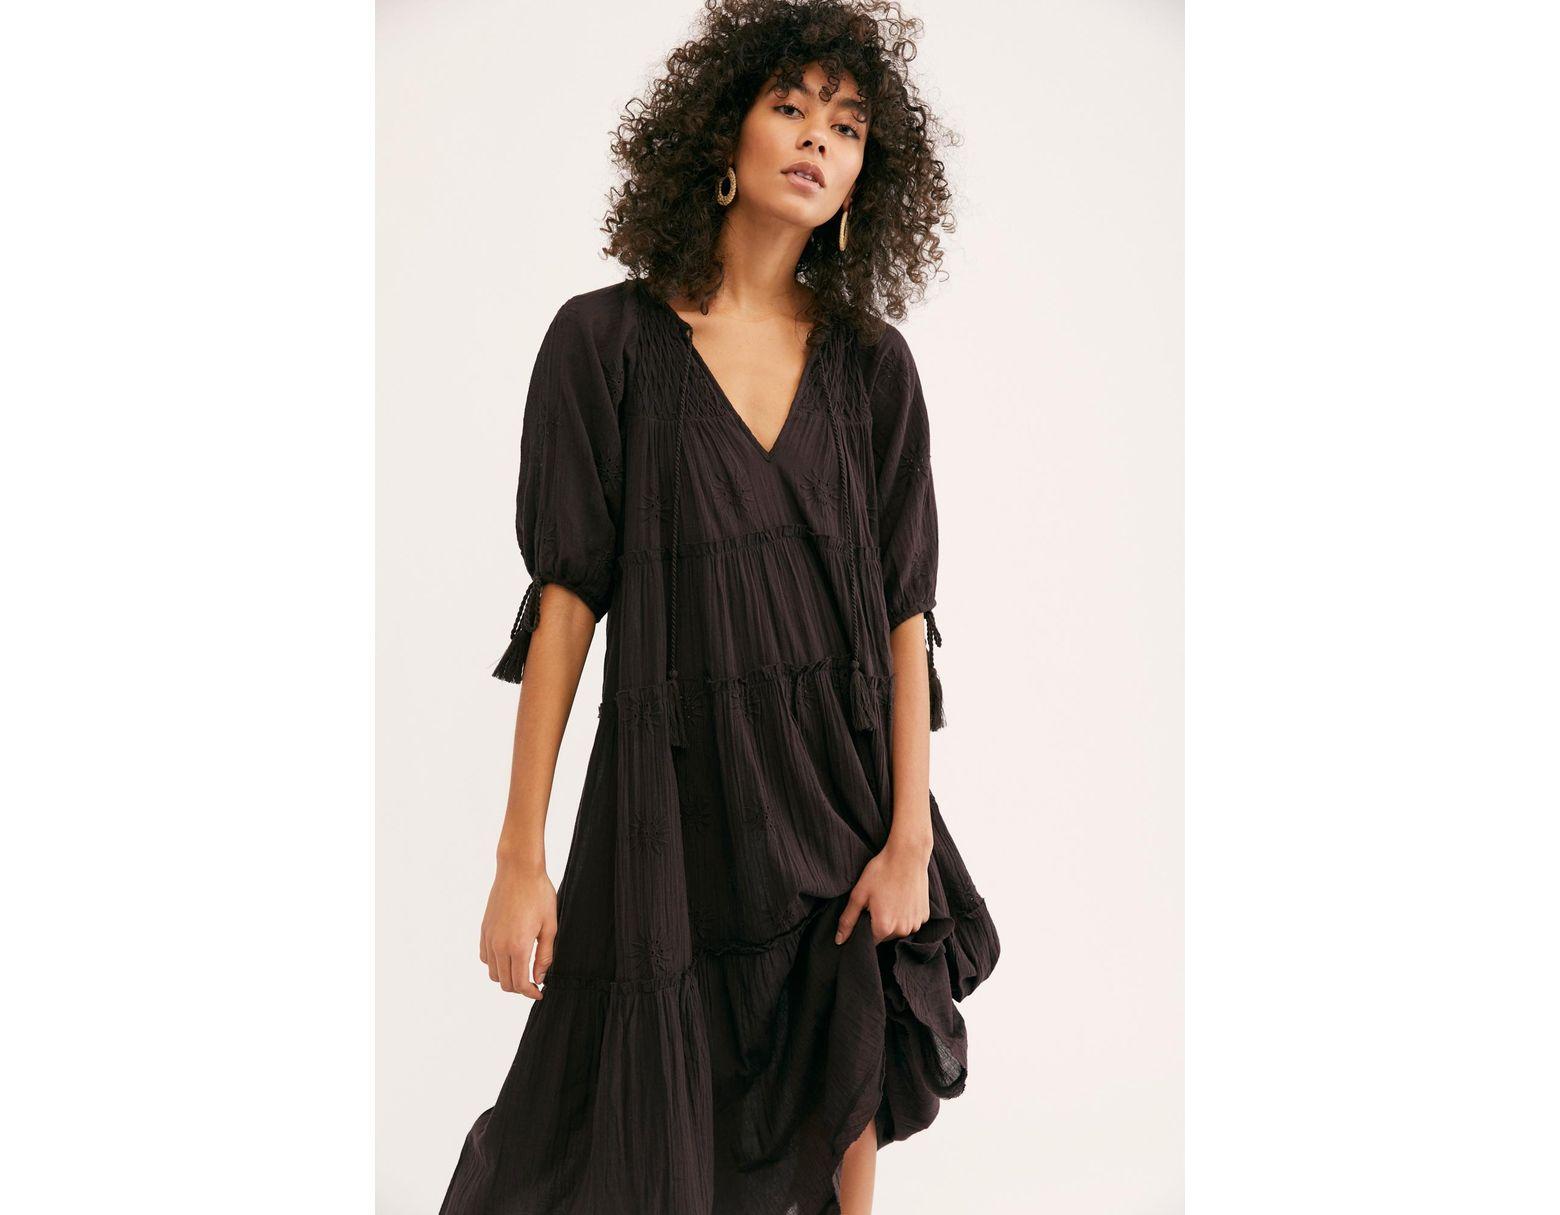 596924c978e8b Women's Brown Celestial Skies Midi Dress